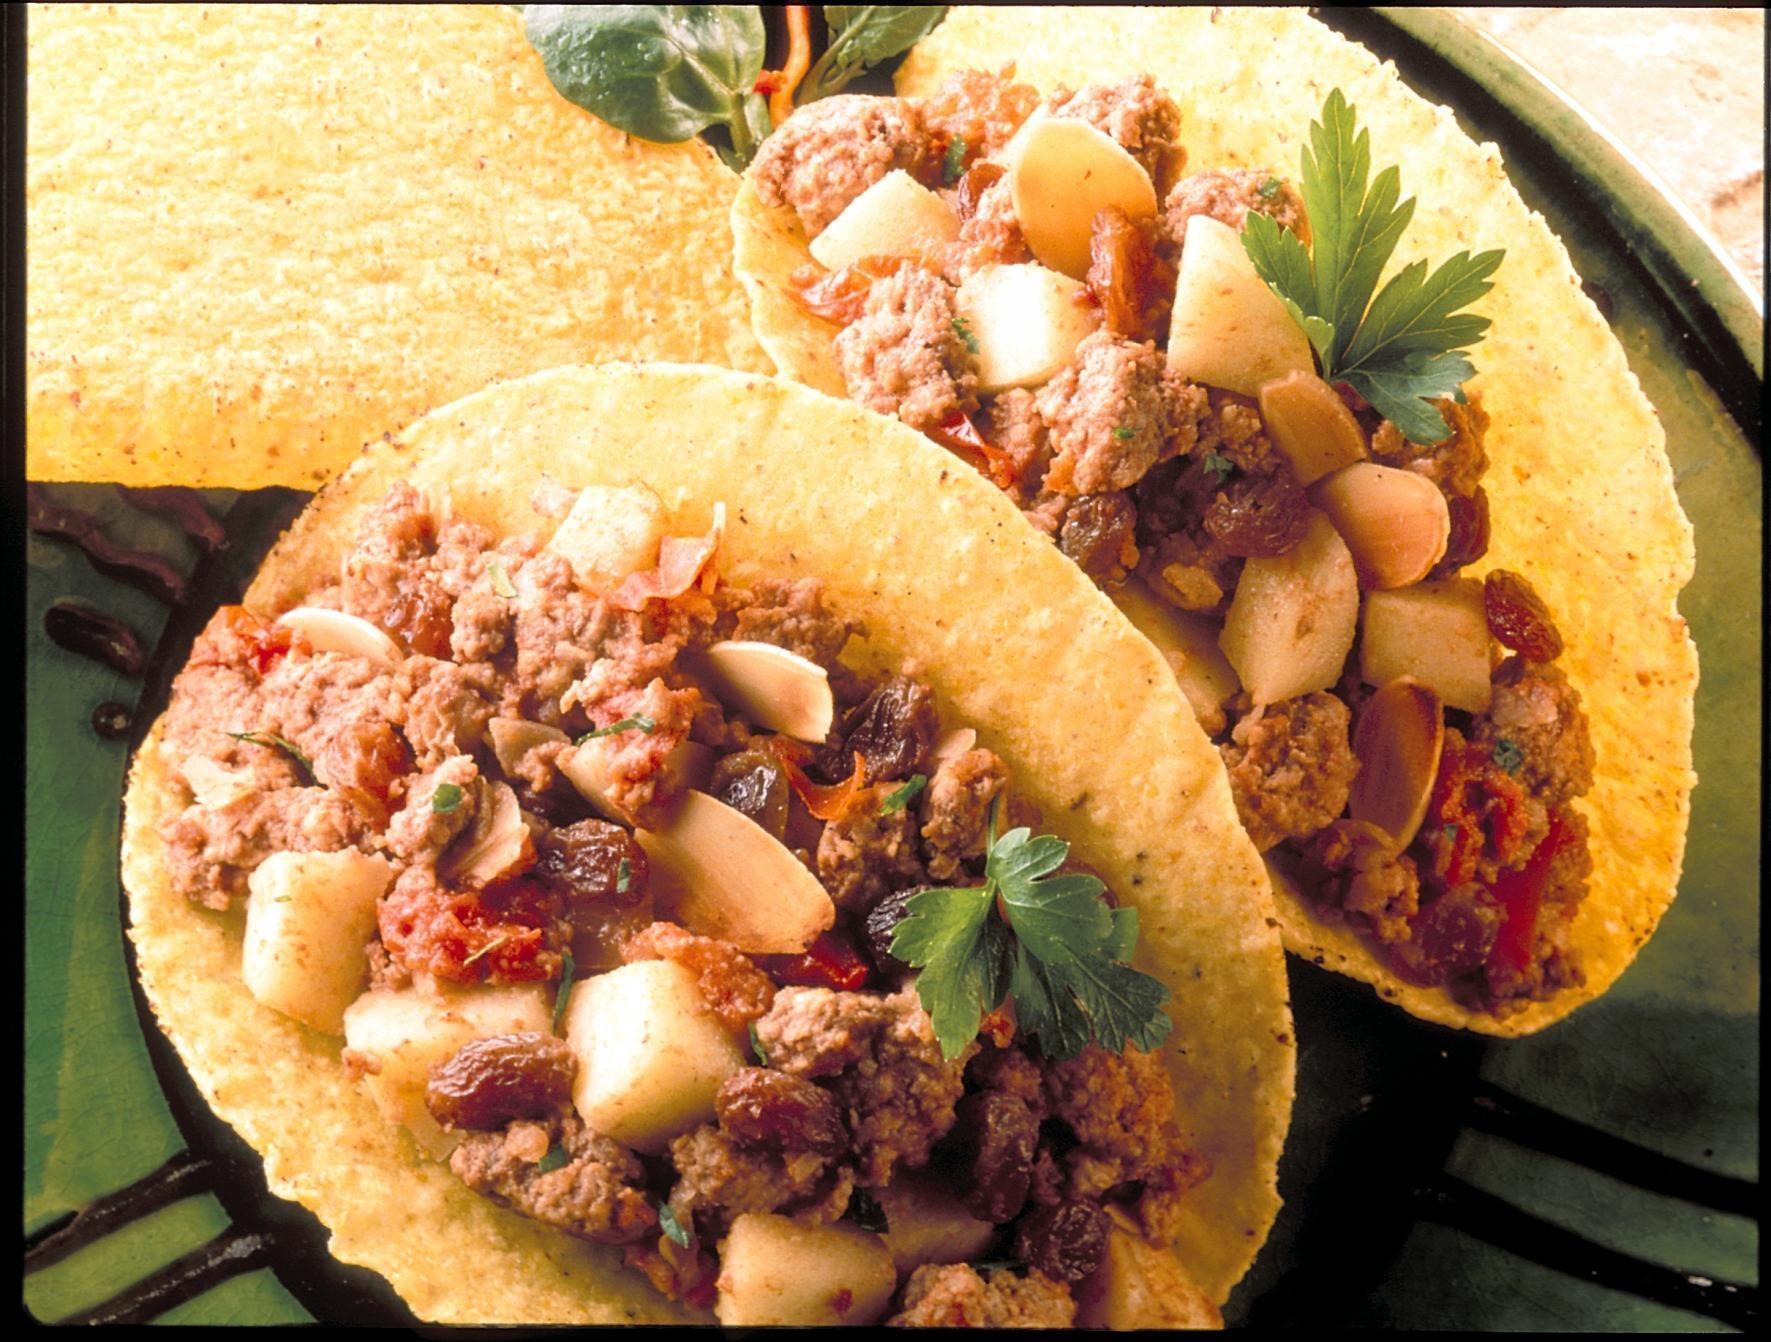 Picadillos mexicains recettes de cuisine la for Viande cuisinee